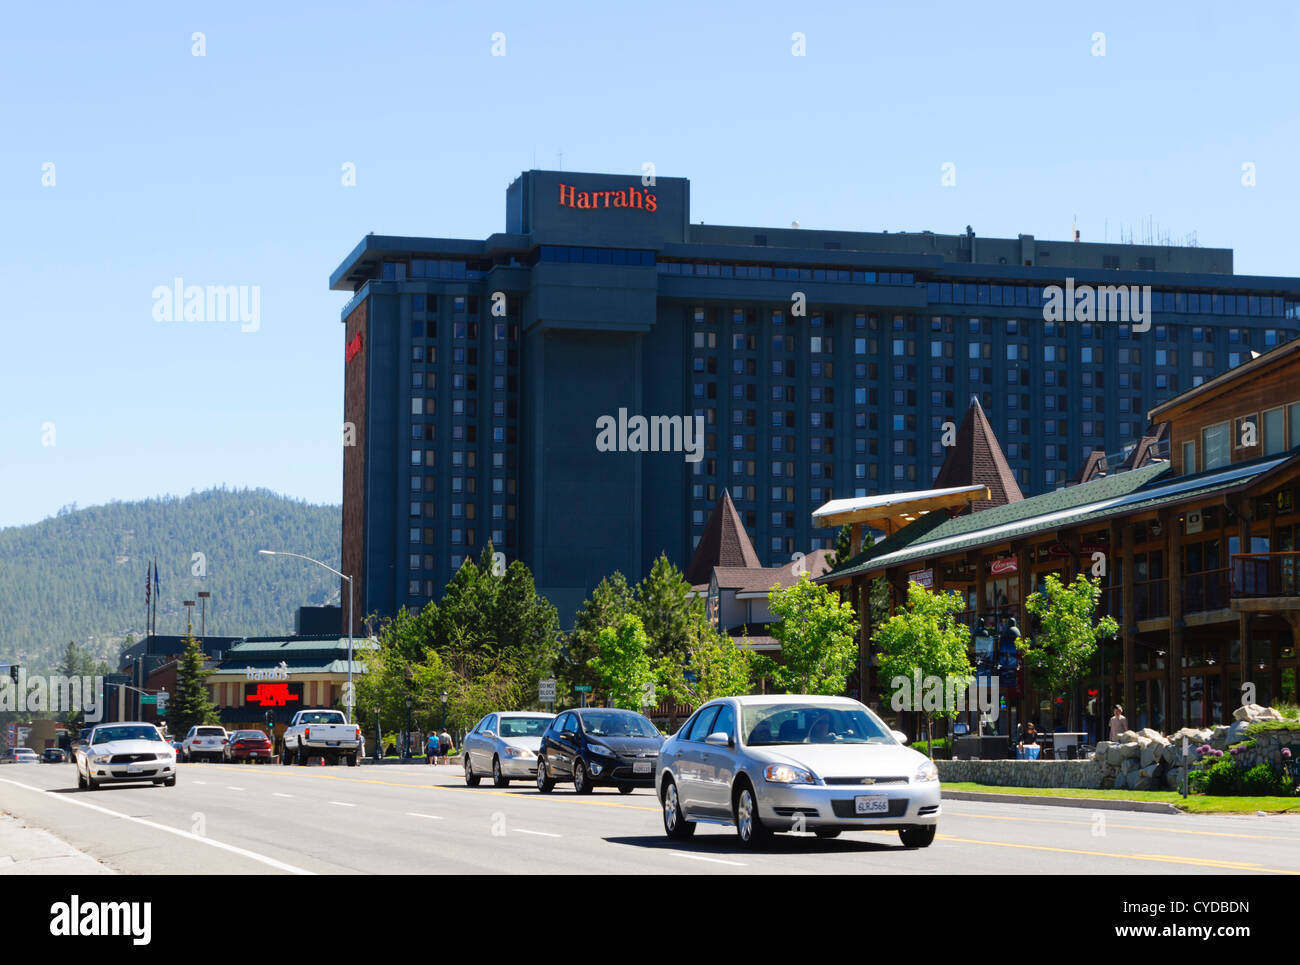 Lake Tahoe - South Lake Tahoe, Harrahs casino hotel over the stateline in Nevada. Stock Photo